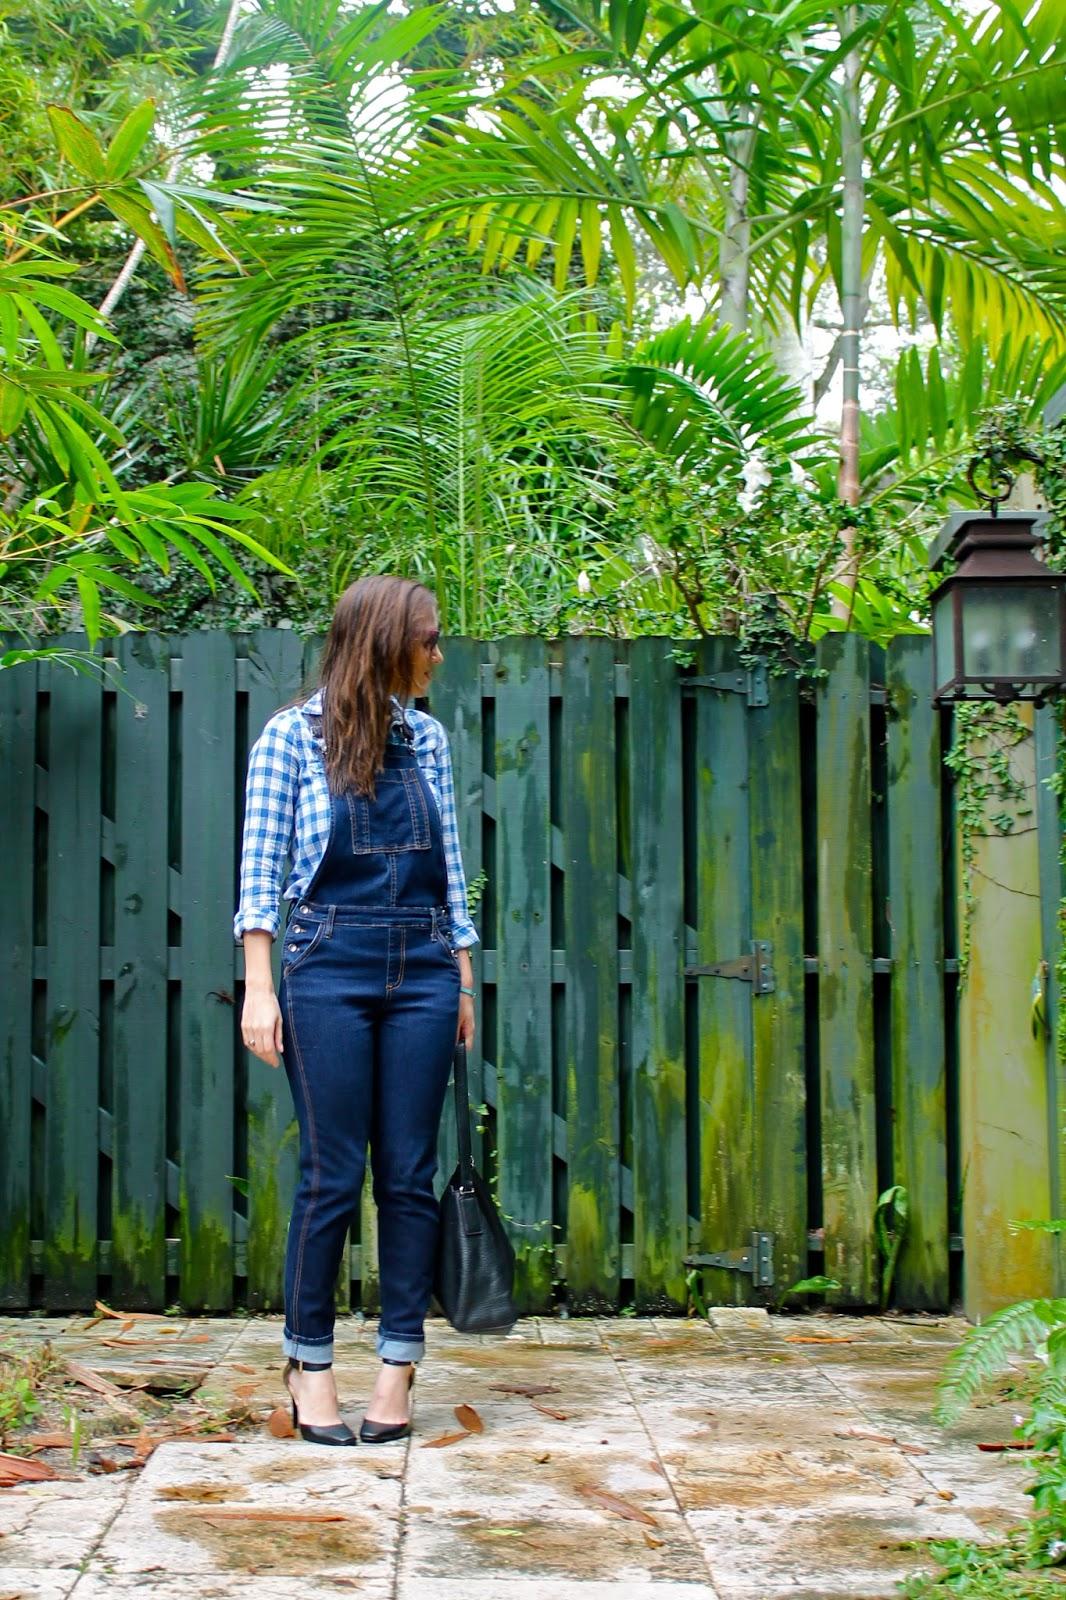 AGAPE Boutique, Abercrombie & Fitch, Kate Spade, Ray-Ban, overalls, fall fashion, winter fashion, outfit idea, Nine West, Miami fashion blogger, Miami fashion, fashion blogger, style blog